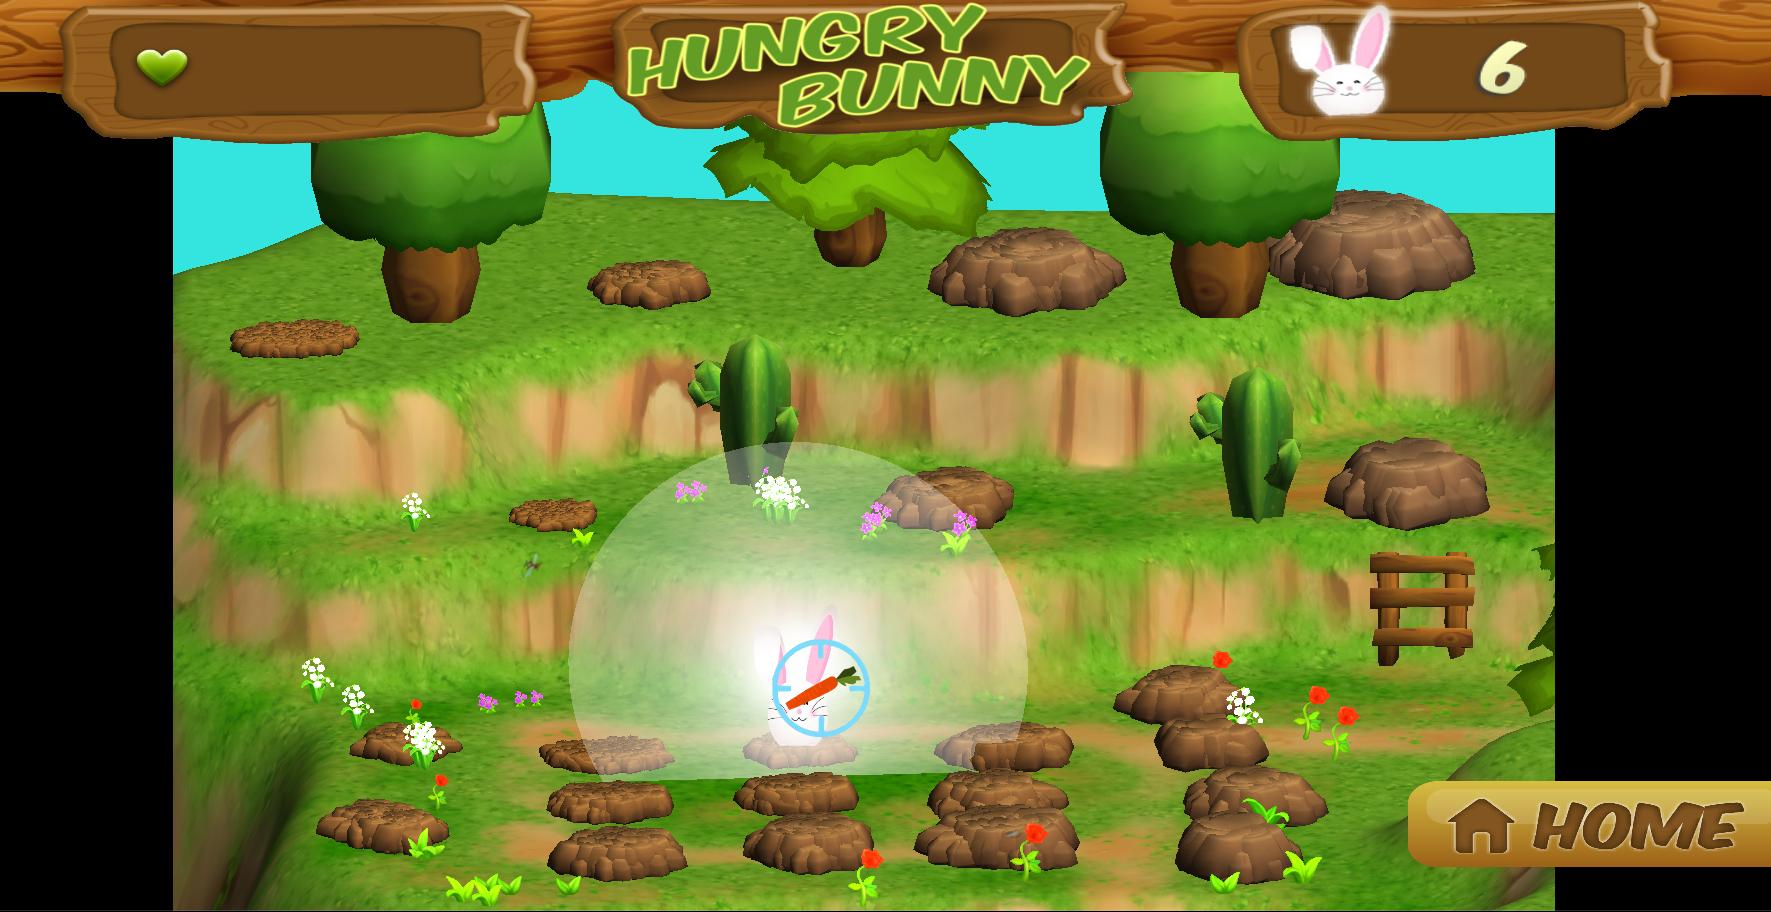 Hungry Bunny Gameplay Screenshot